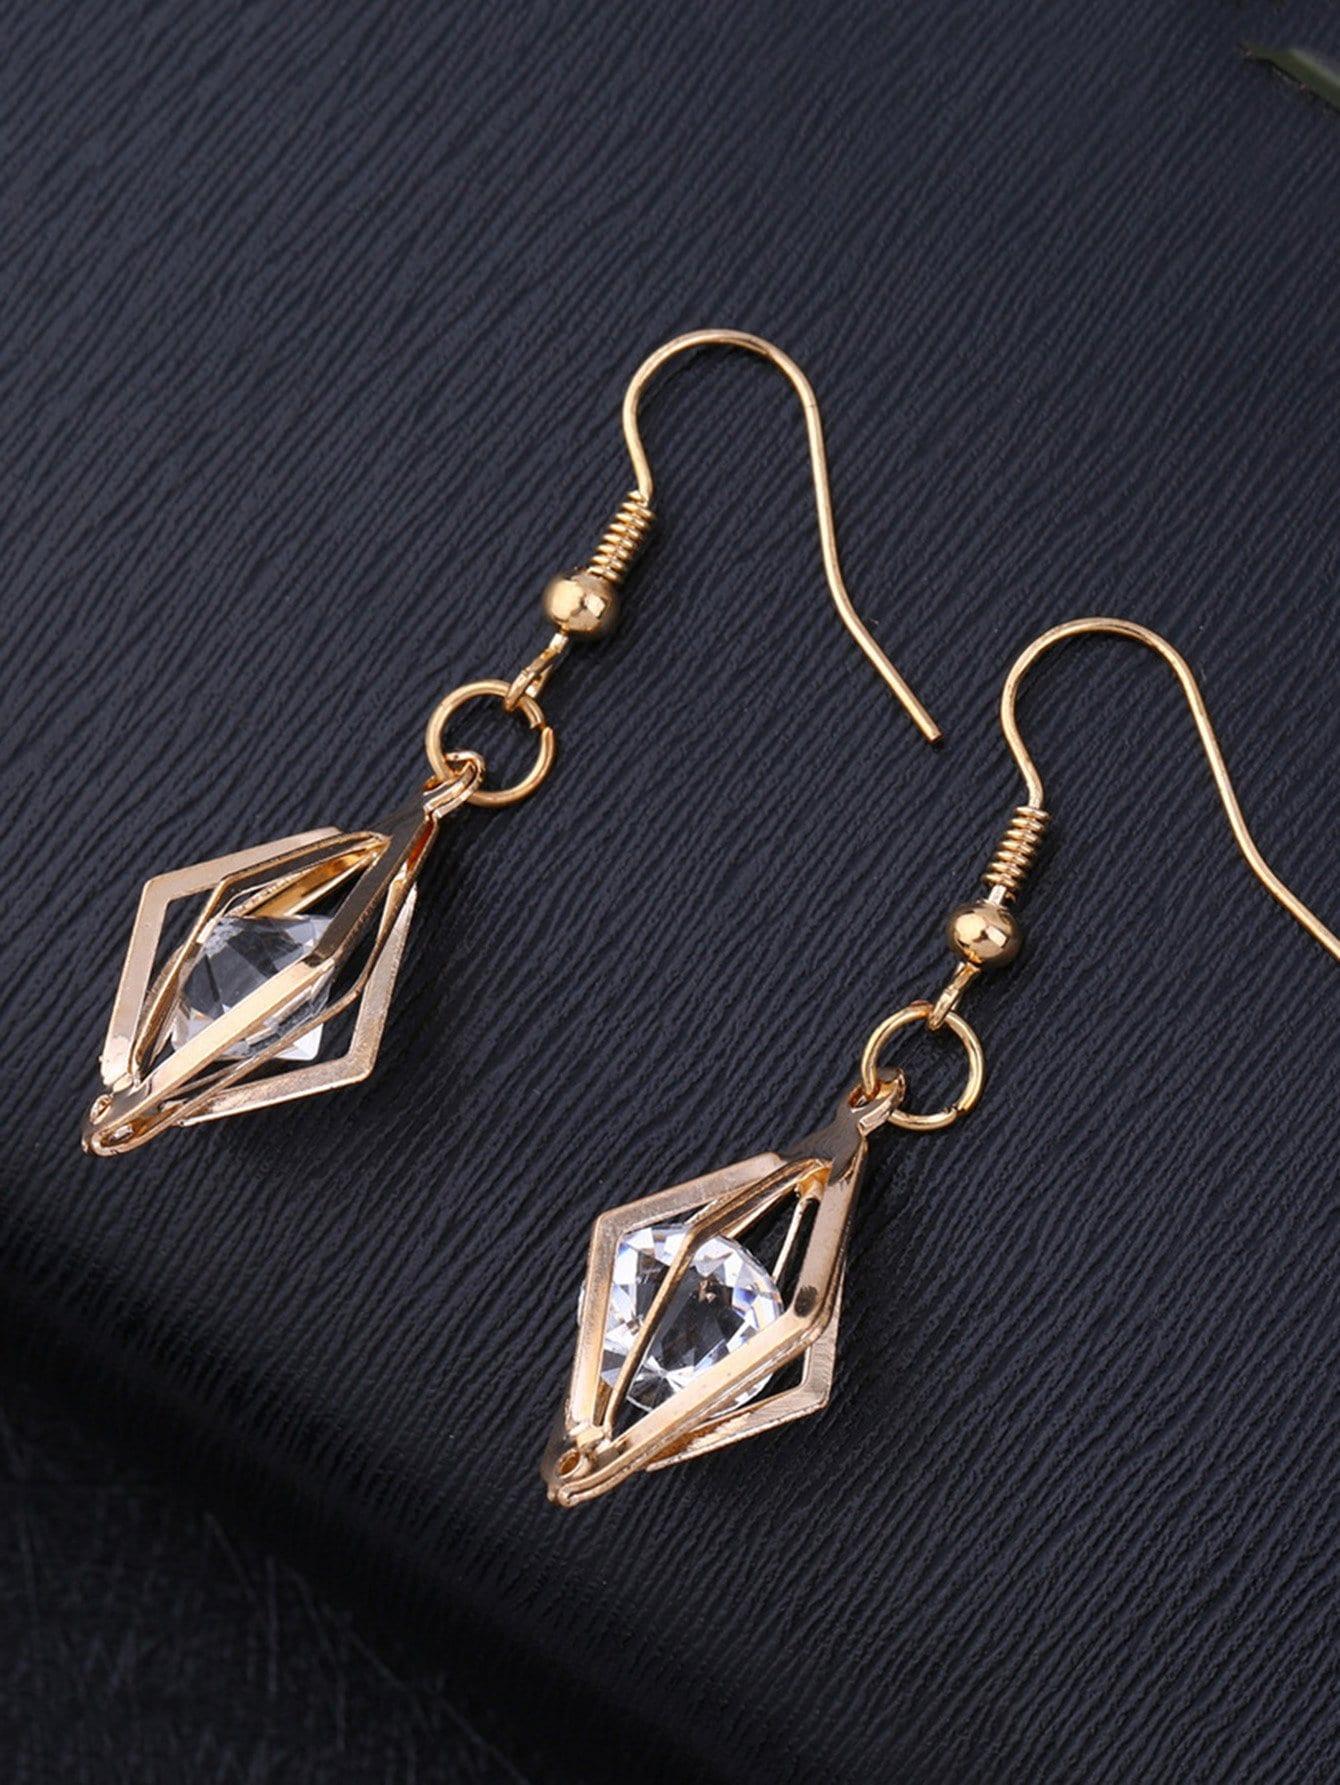 Hollow Design Drop Earrings With Rhinestone